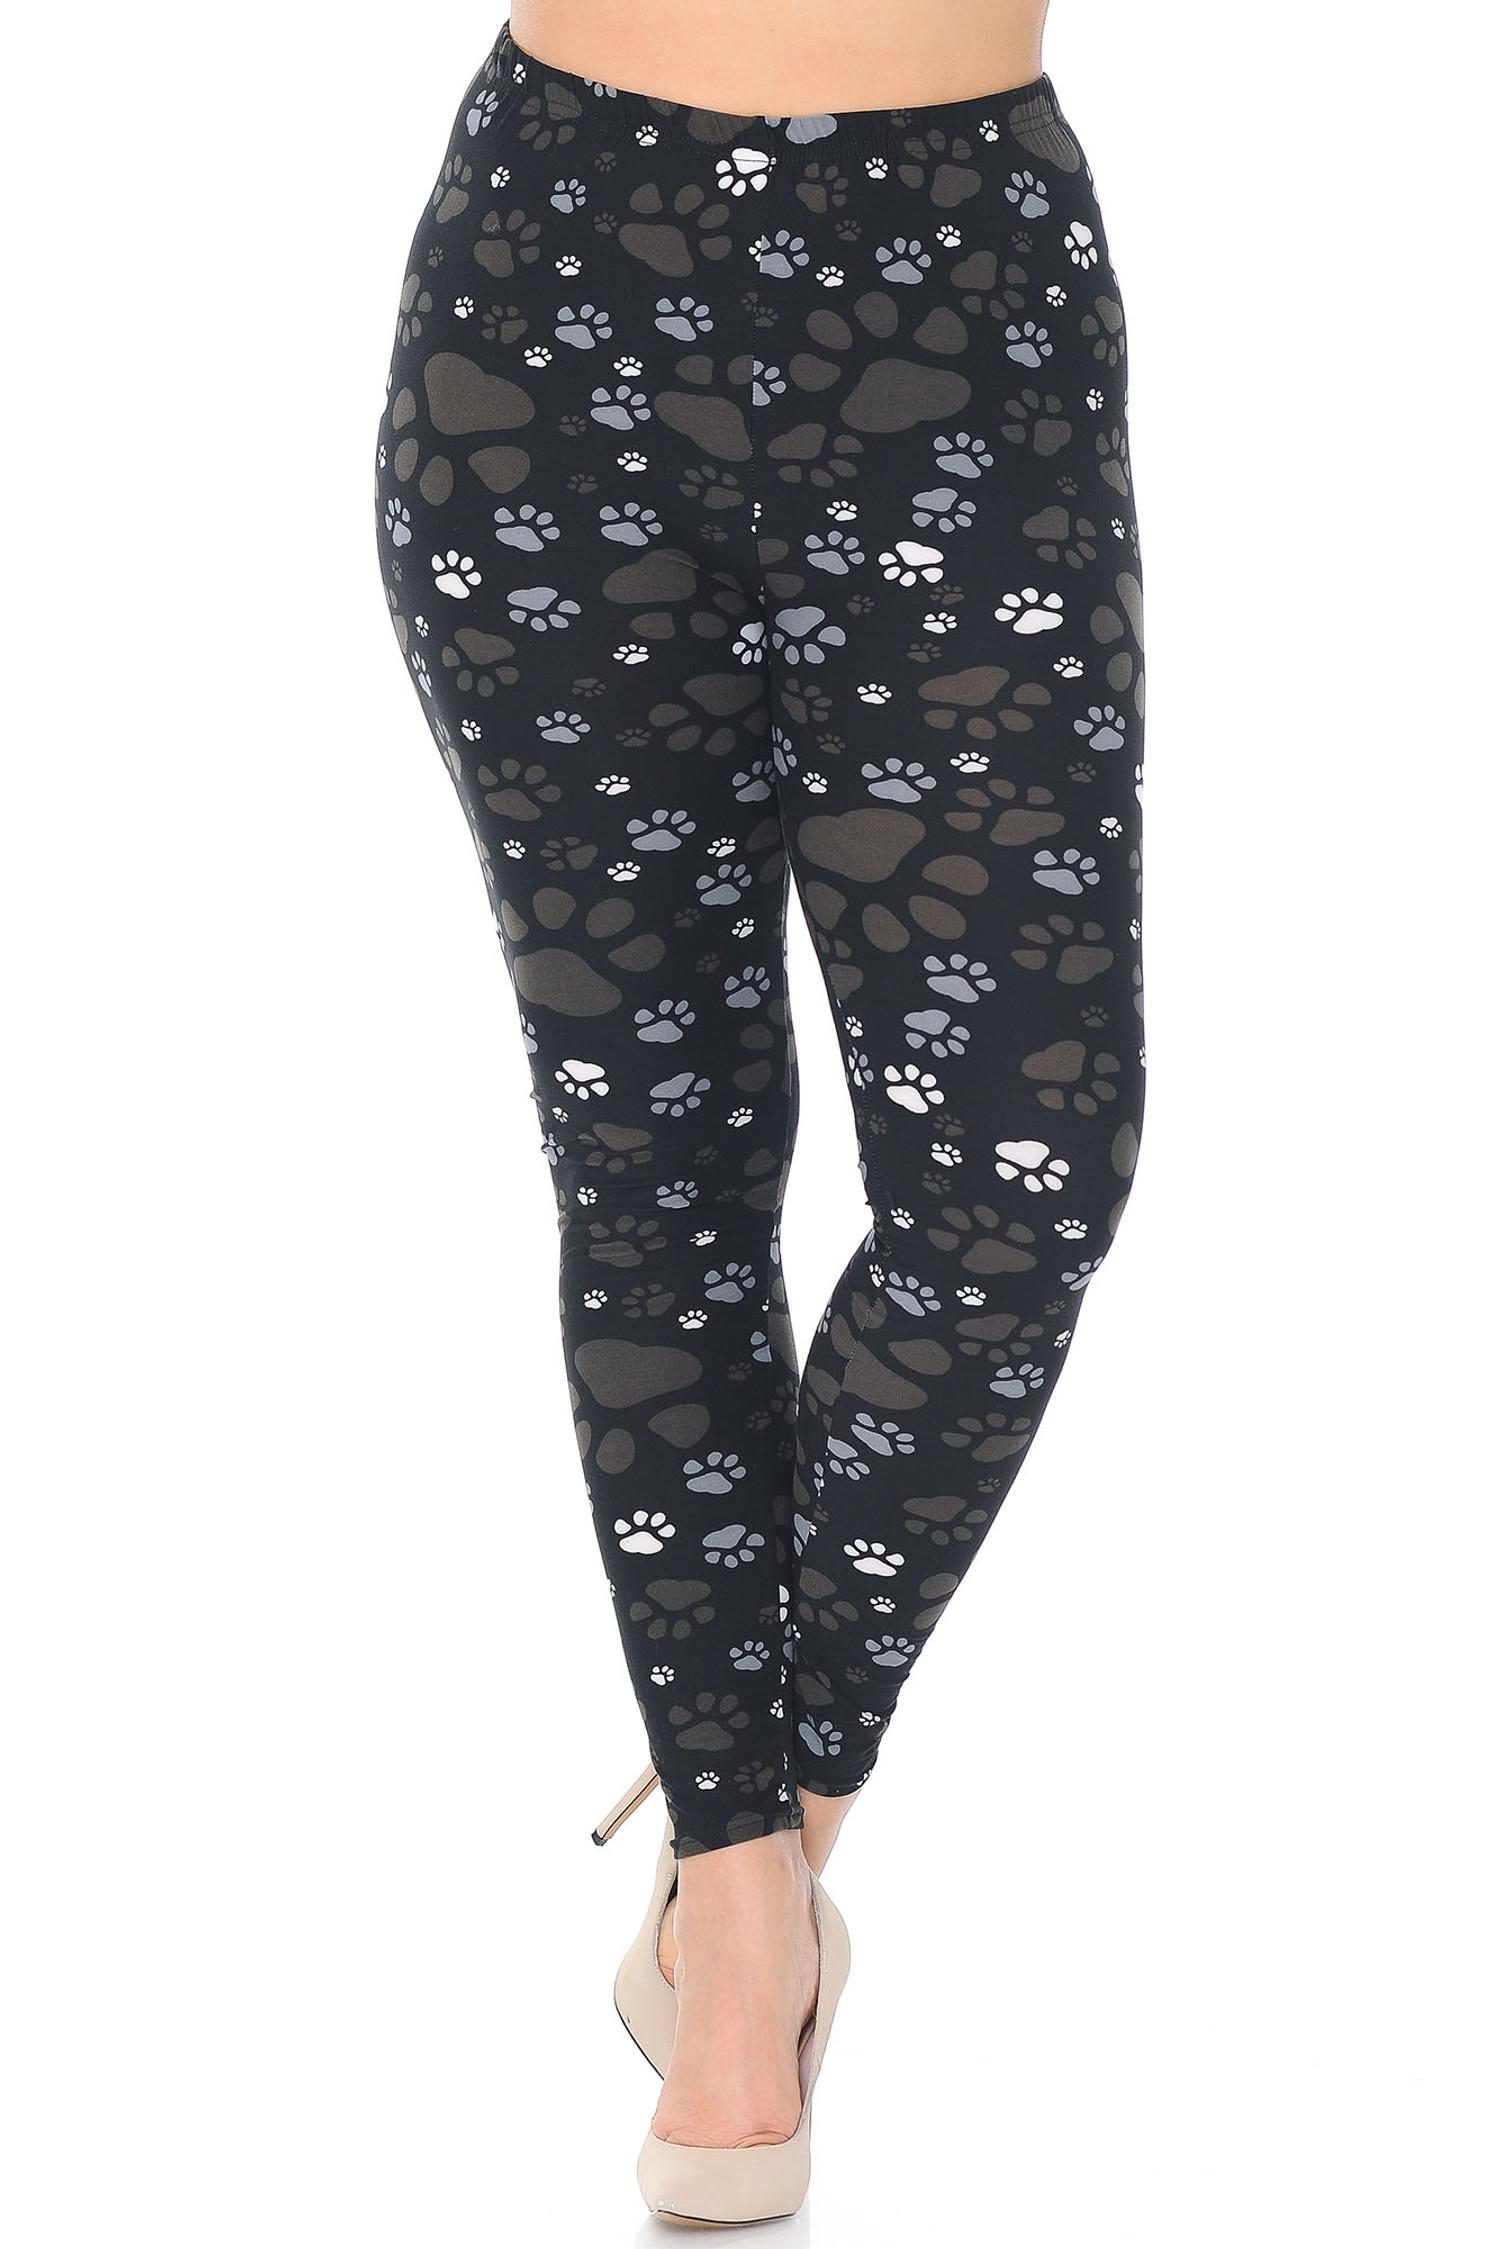 Front of Creamy Soft Muddy Paw Print Extra Plus Size Leggings - 3X-5X - USA Fashion™